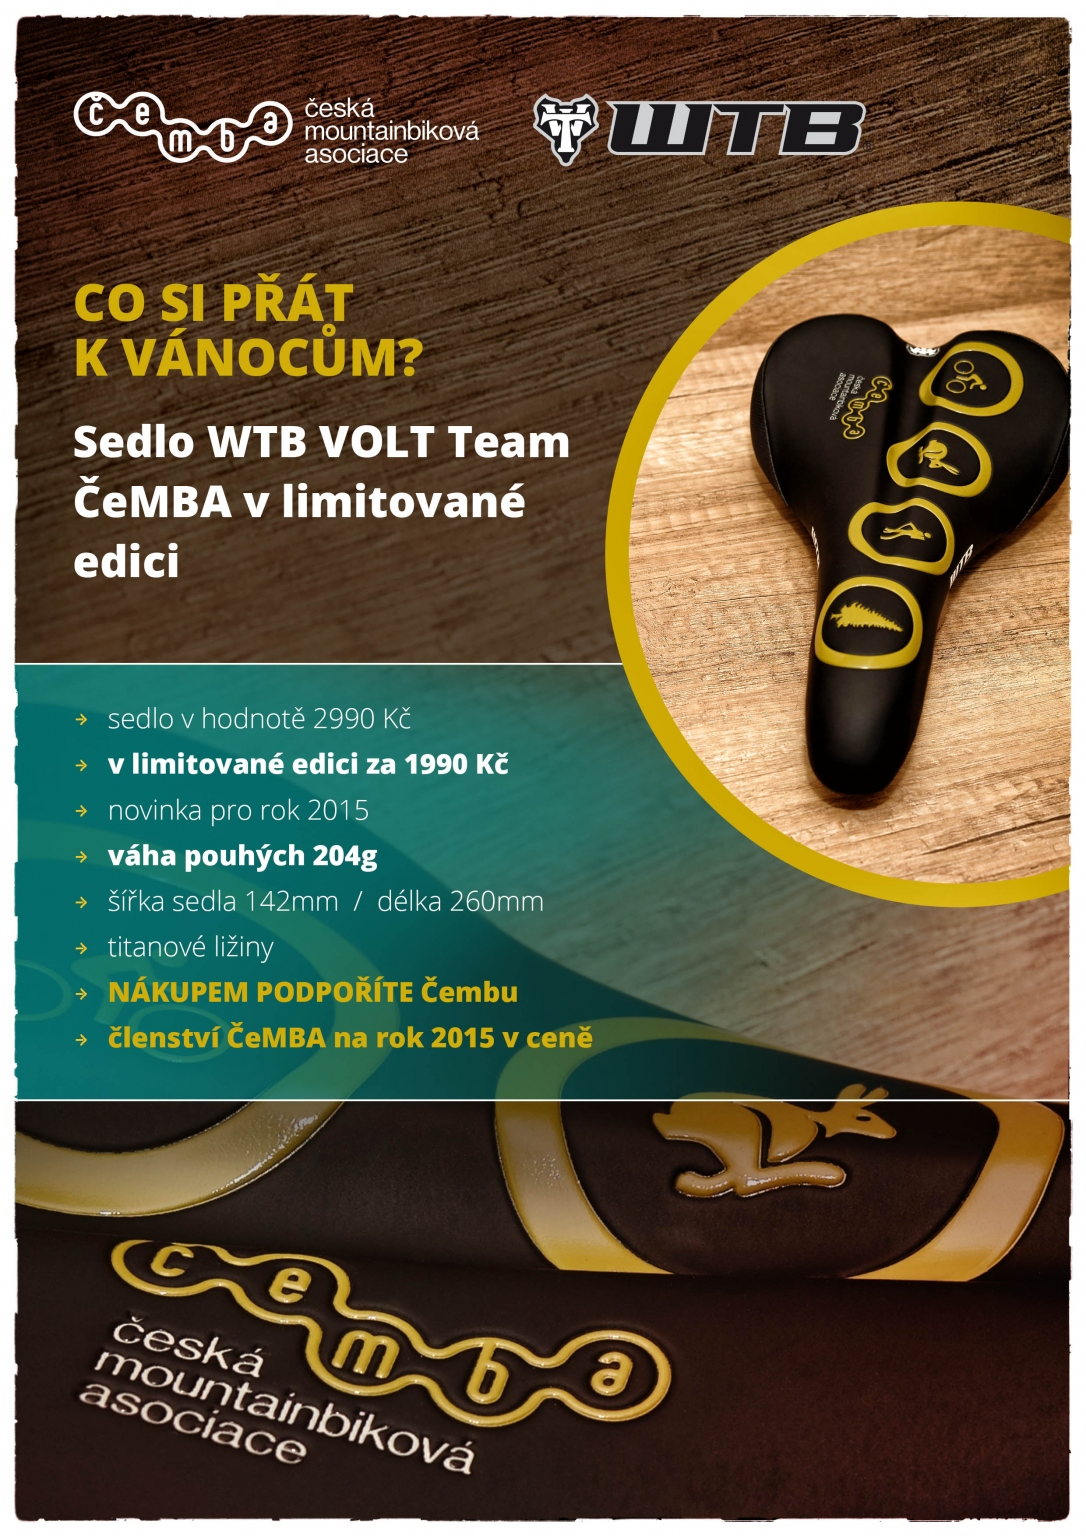 Sedlo-WTB-CeMBA-promo-04